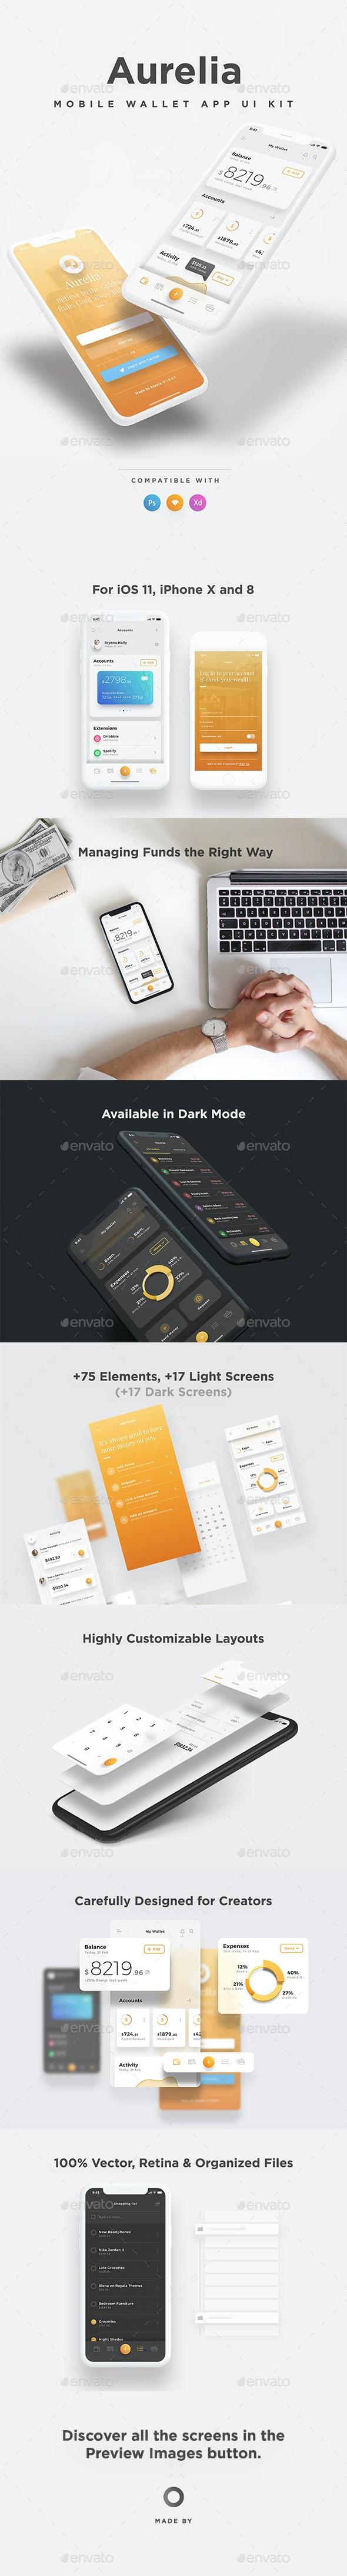 Aurelia Mobile UI Kit - Aesthetic Mobile Wallet & Crypto App UI Kit - User Interfaces Web Elements